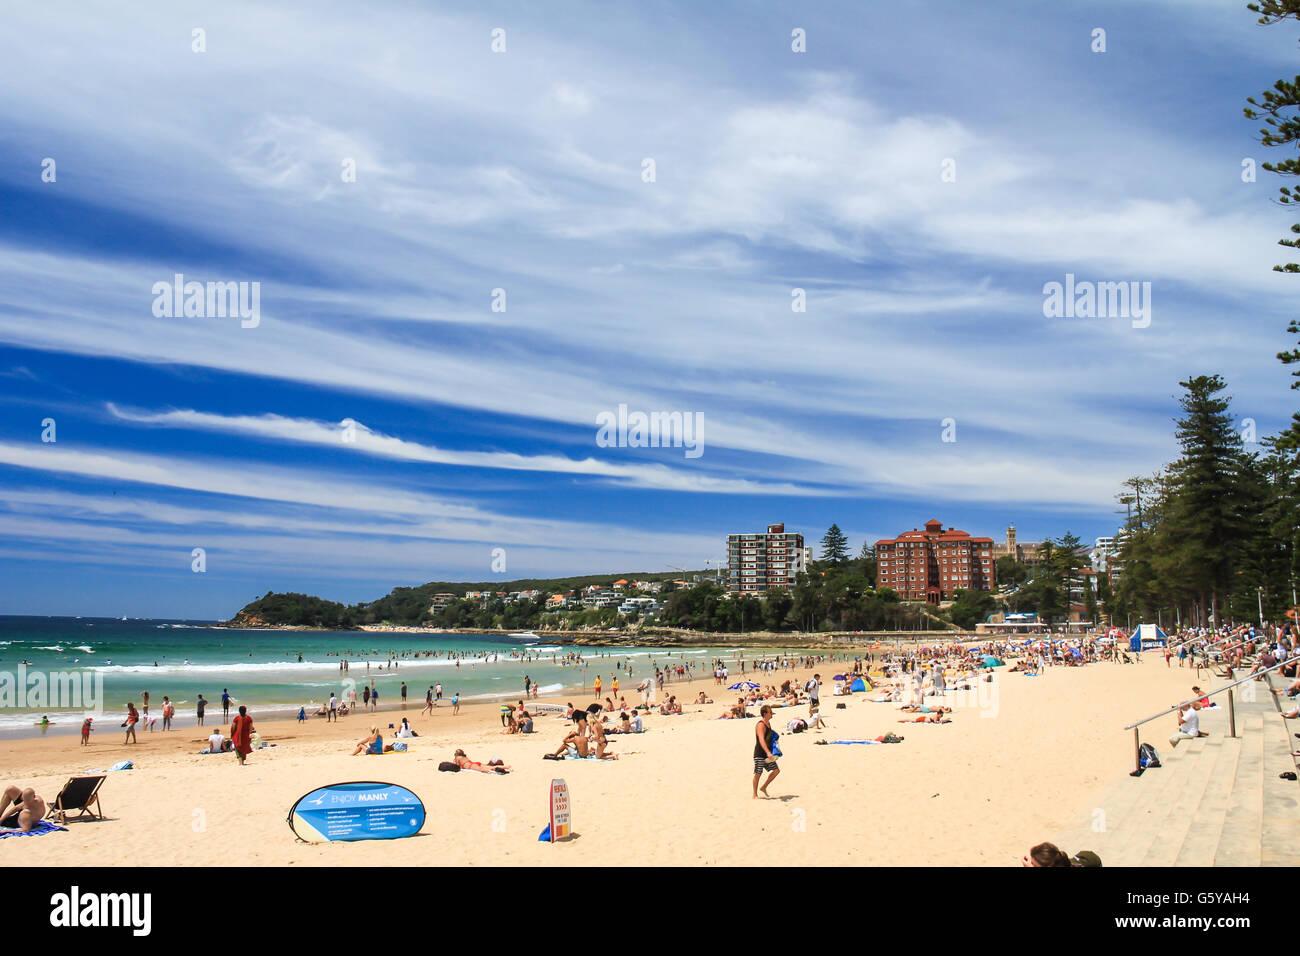 Summer in Manly Beach Sydney Australia - Stock Image